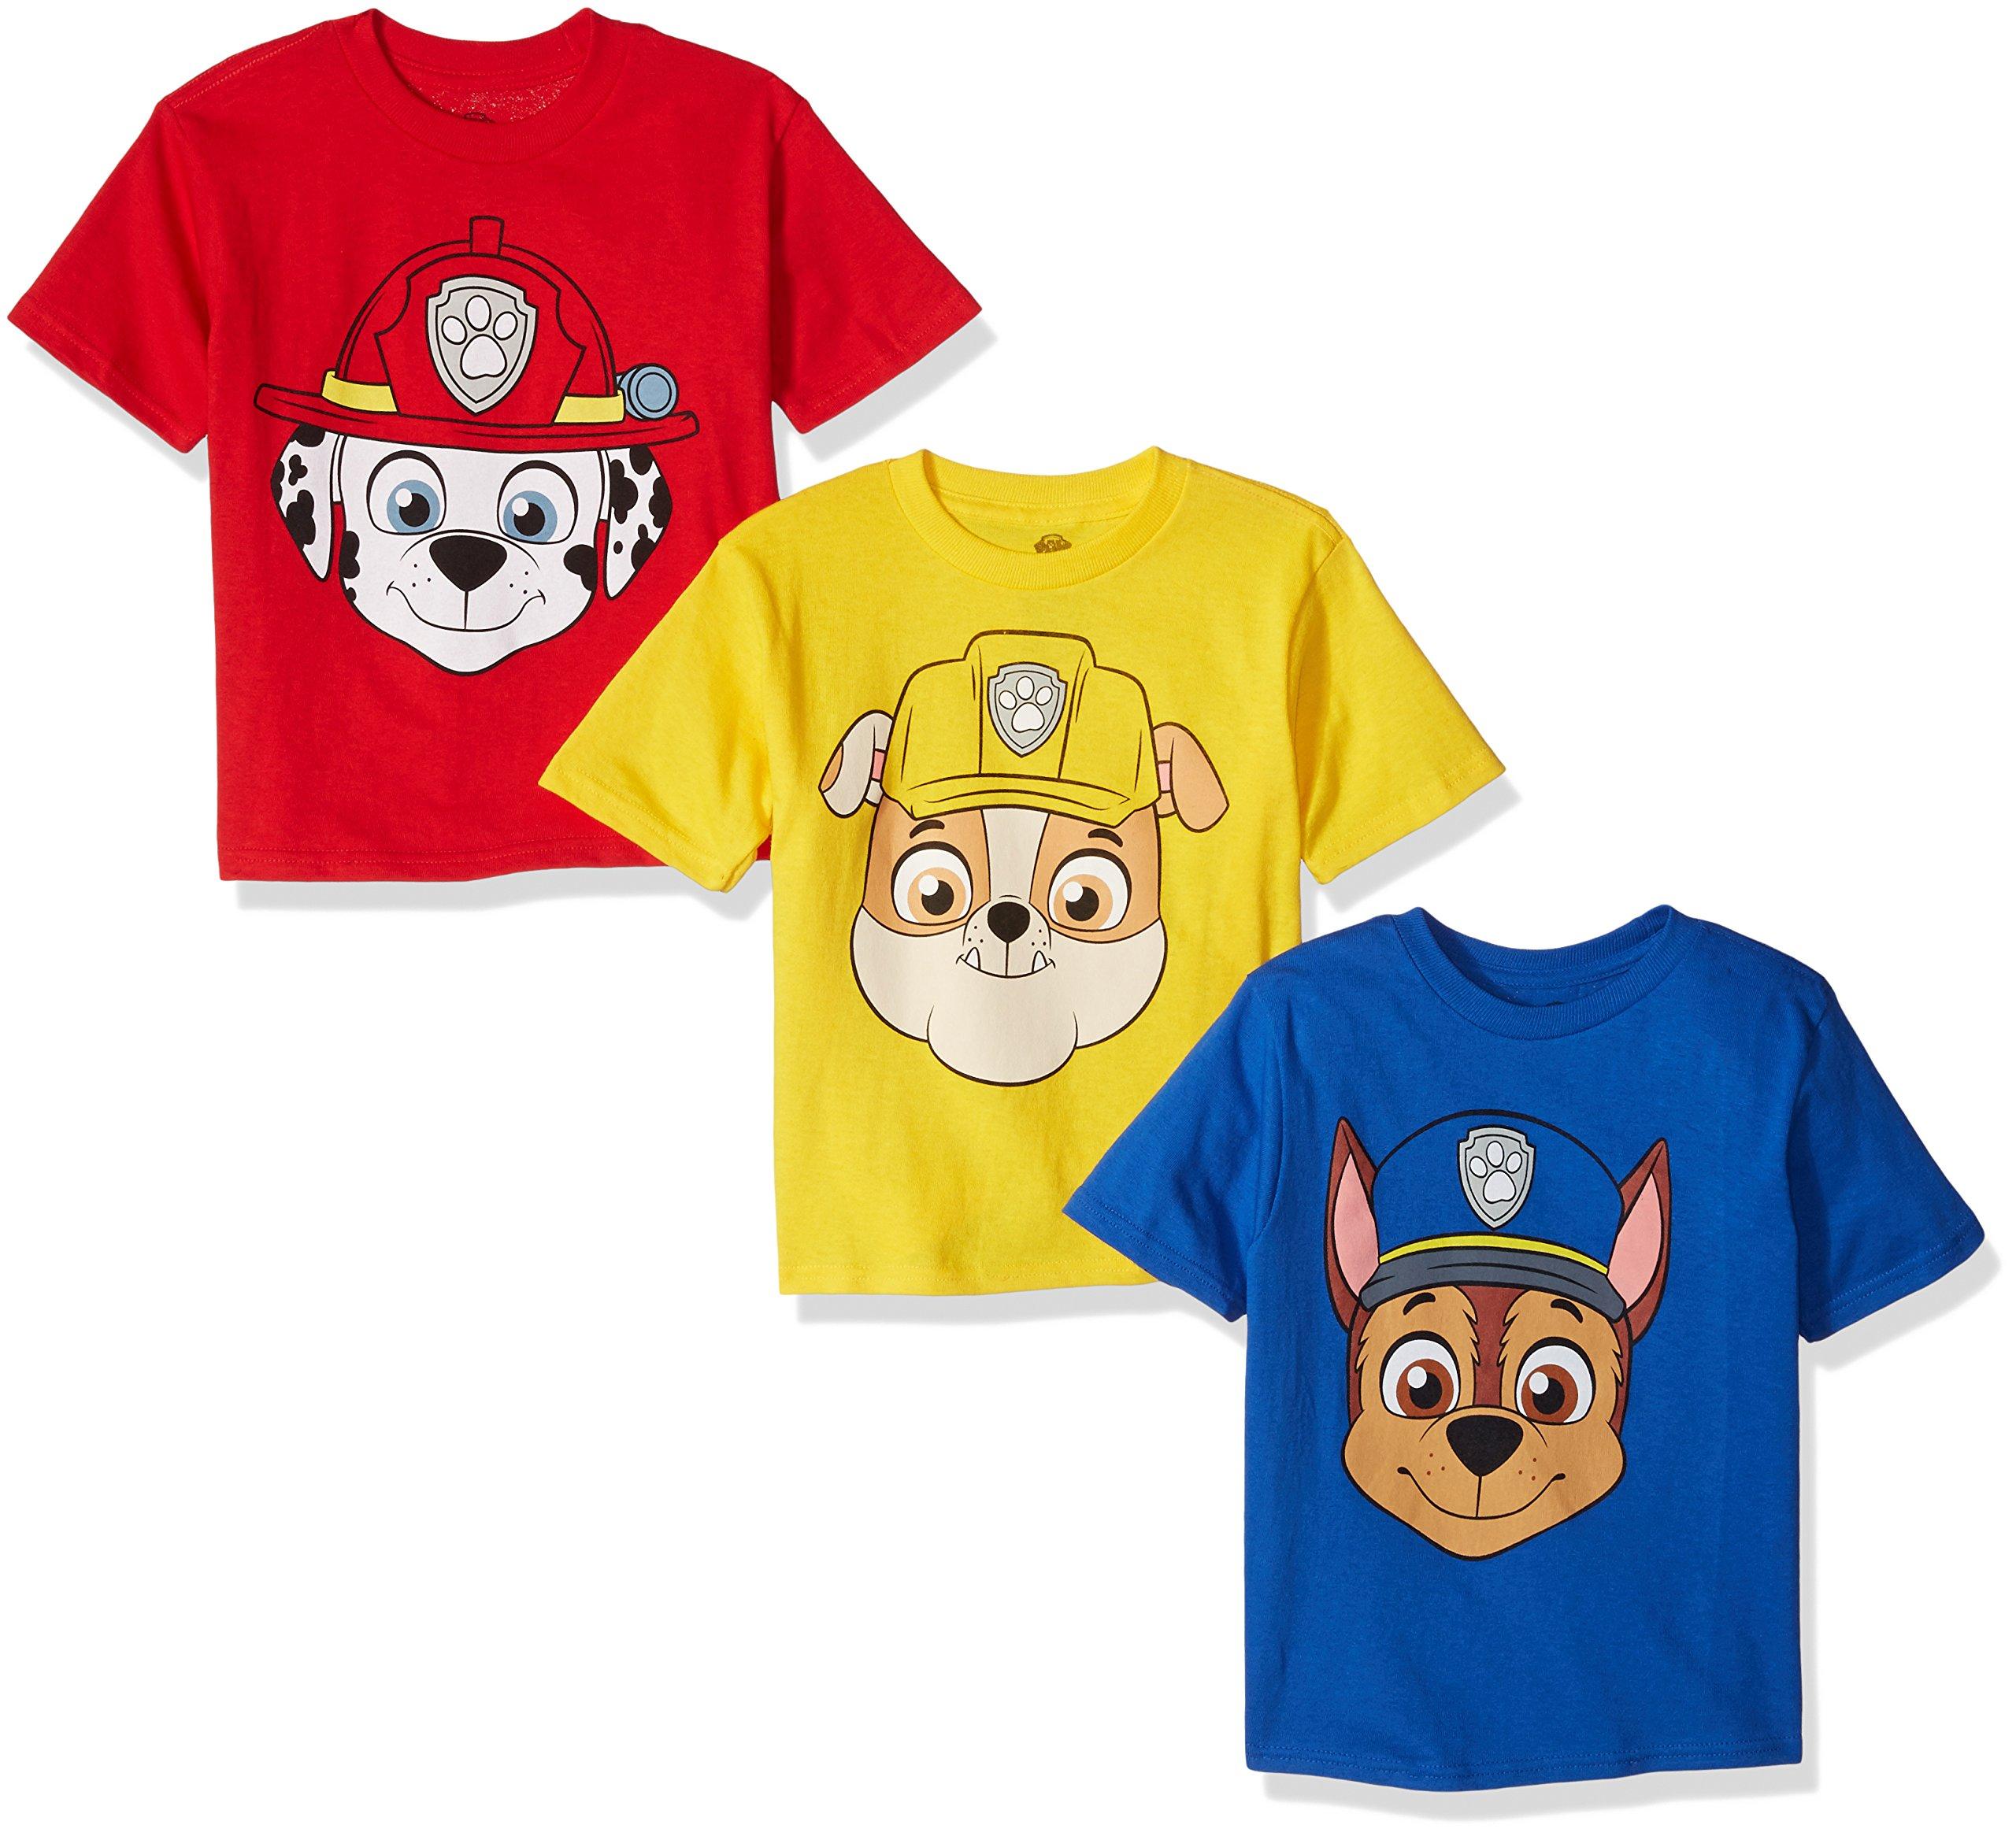 Nickelodeon Nick International子供用ドッグパトロールチームスリーピースTシャツ